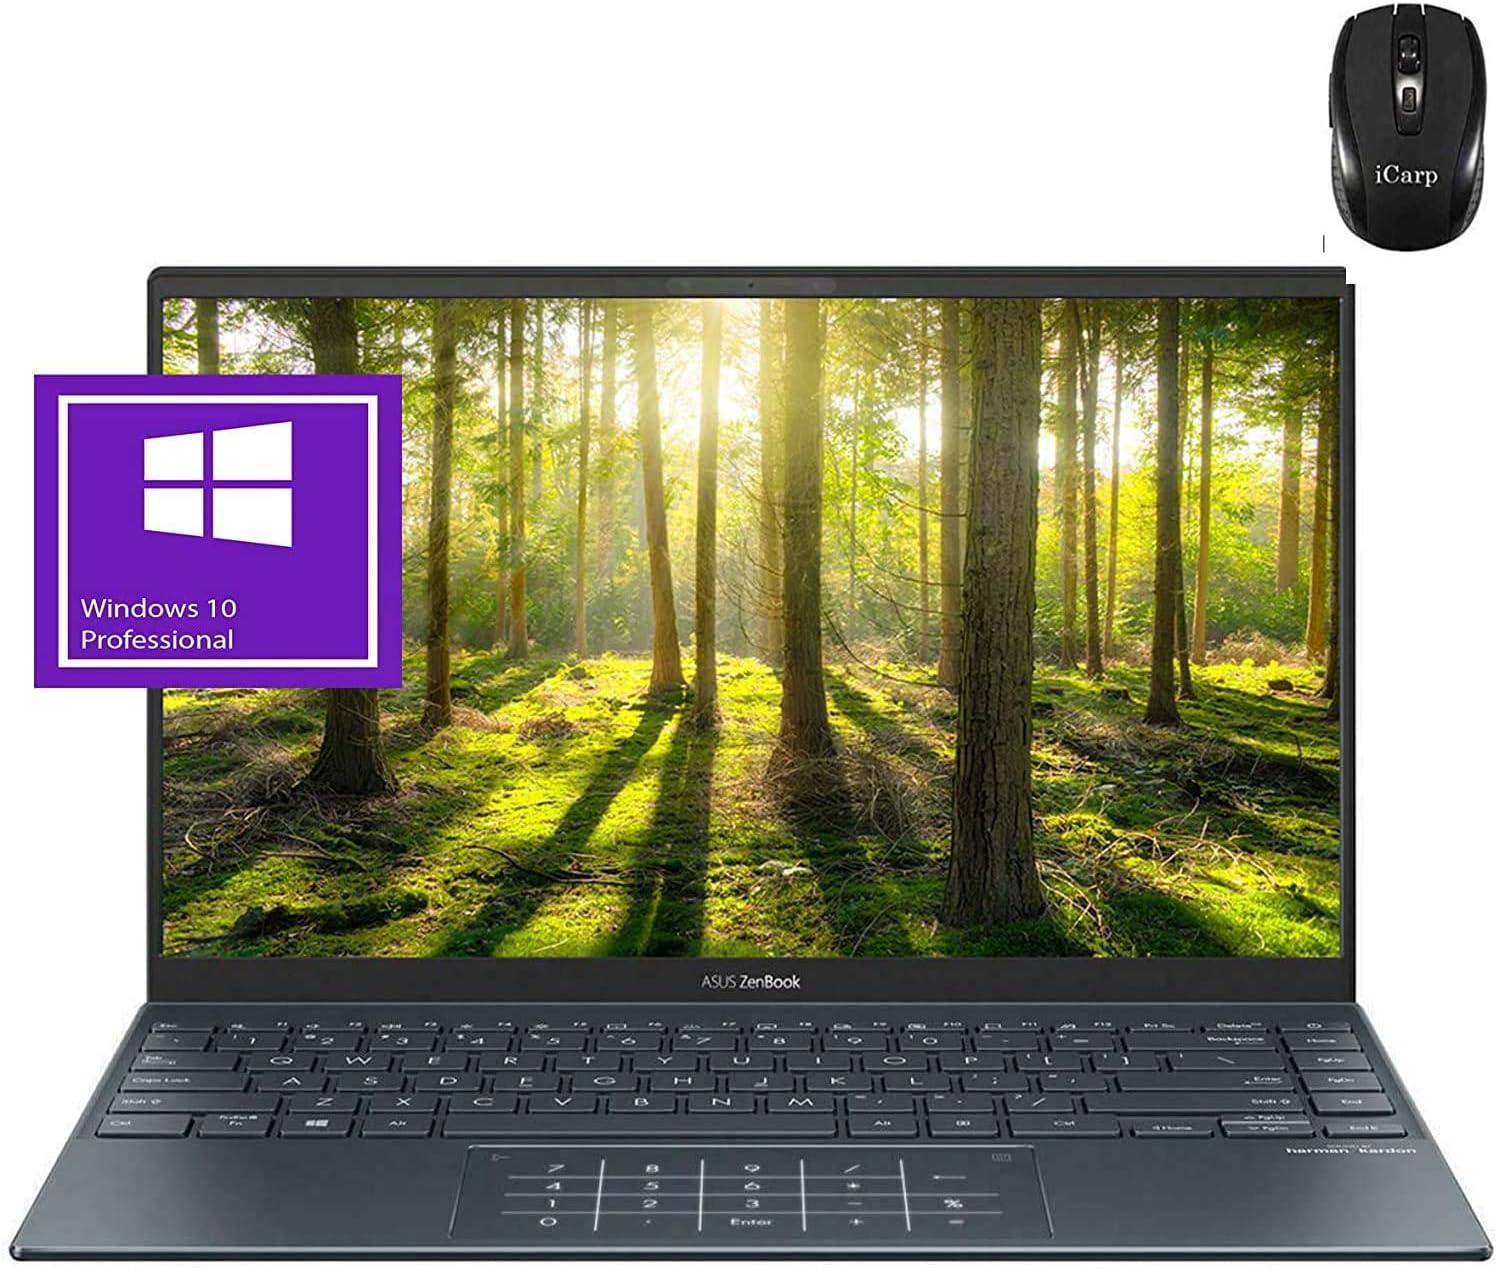 "2020 Flagship Asus Zenbook 14 Laptop 14"" FHD IPS Anti-Glare 100% sRGB AMD Octa-Core Ryzen 7 4700U (Beats i7-10710U) 16GB RAM 1TB PCIe SSD Backlit HDMI USB-C Wifi6 Win10 Pro + iCarp Wireless Mouse"